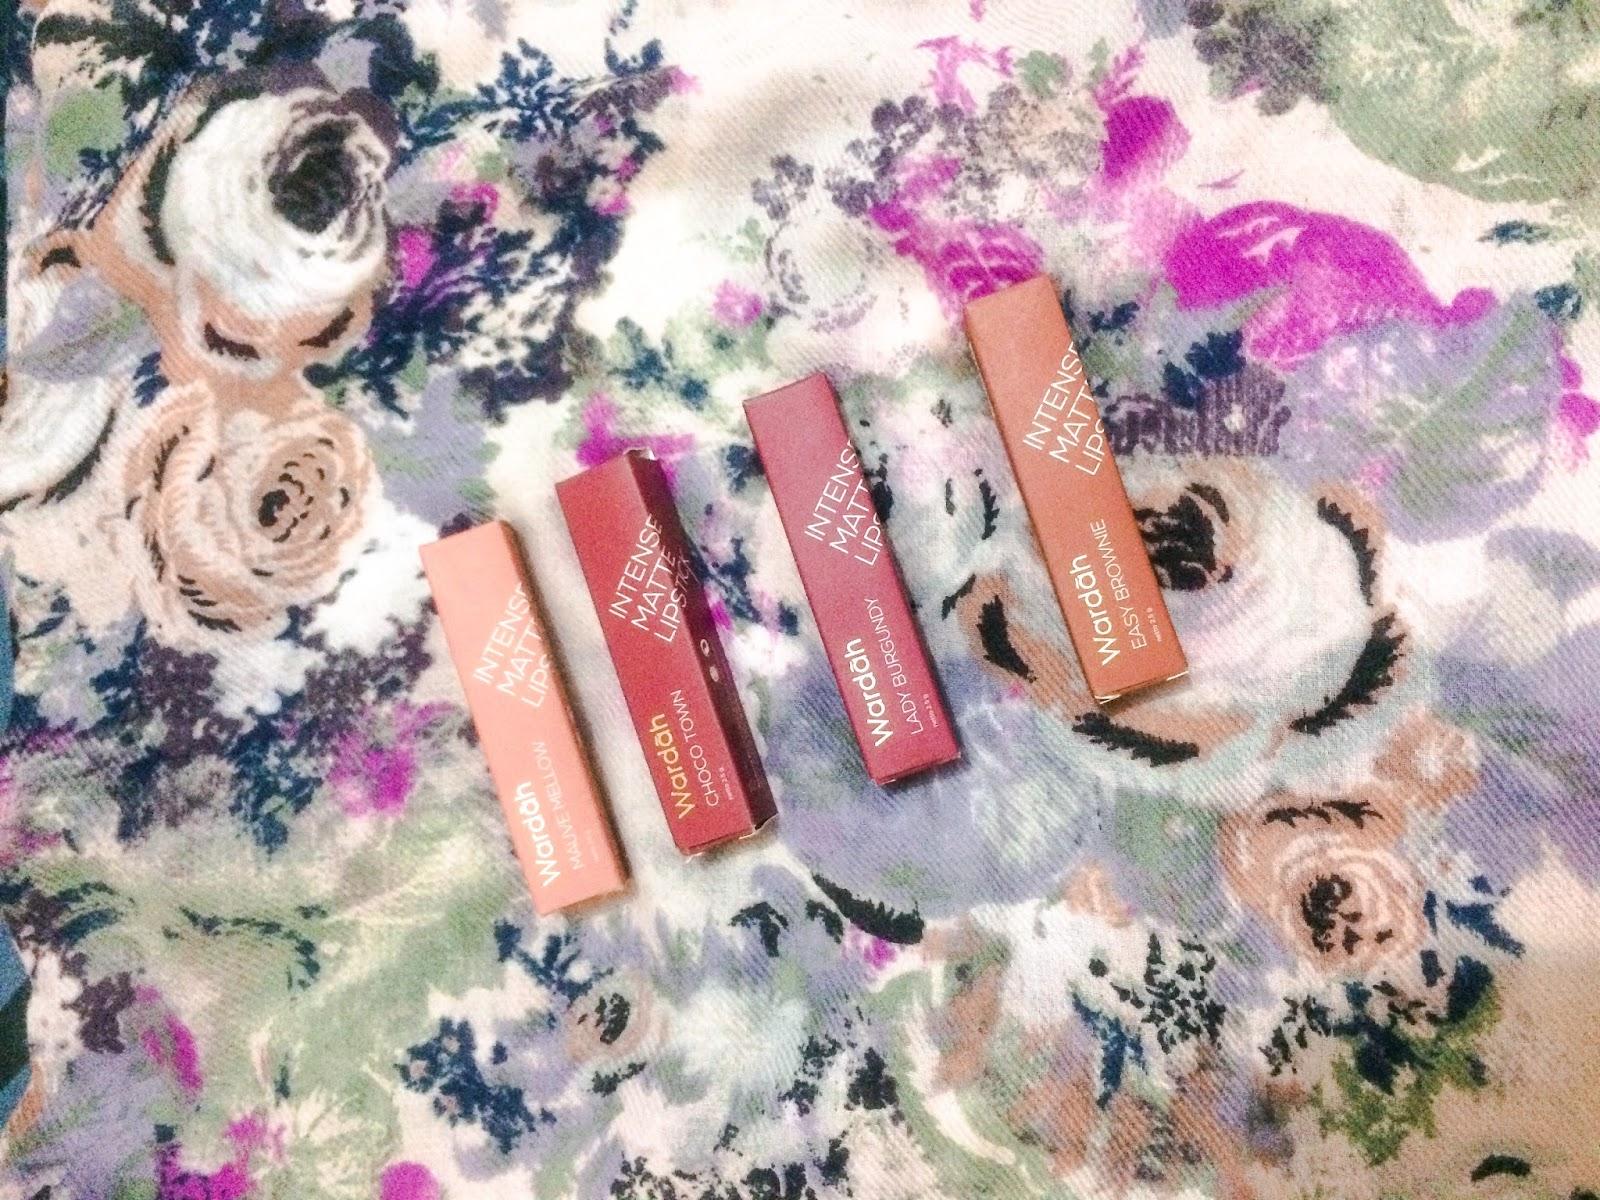 Wardah Intense Matte Lipstick Review Choco Town Mauve Nude Lady Lipstik Akhirnya Aku Memutuskan Untuk Cobain 5 Varian Yaitu Blushing Yang Sudah Di Sini